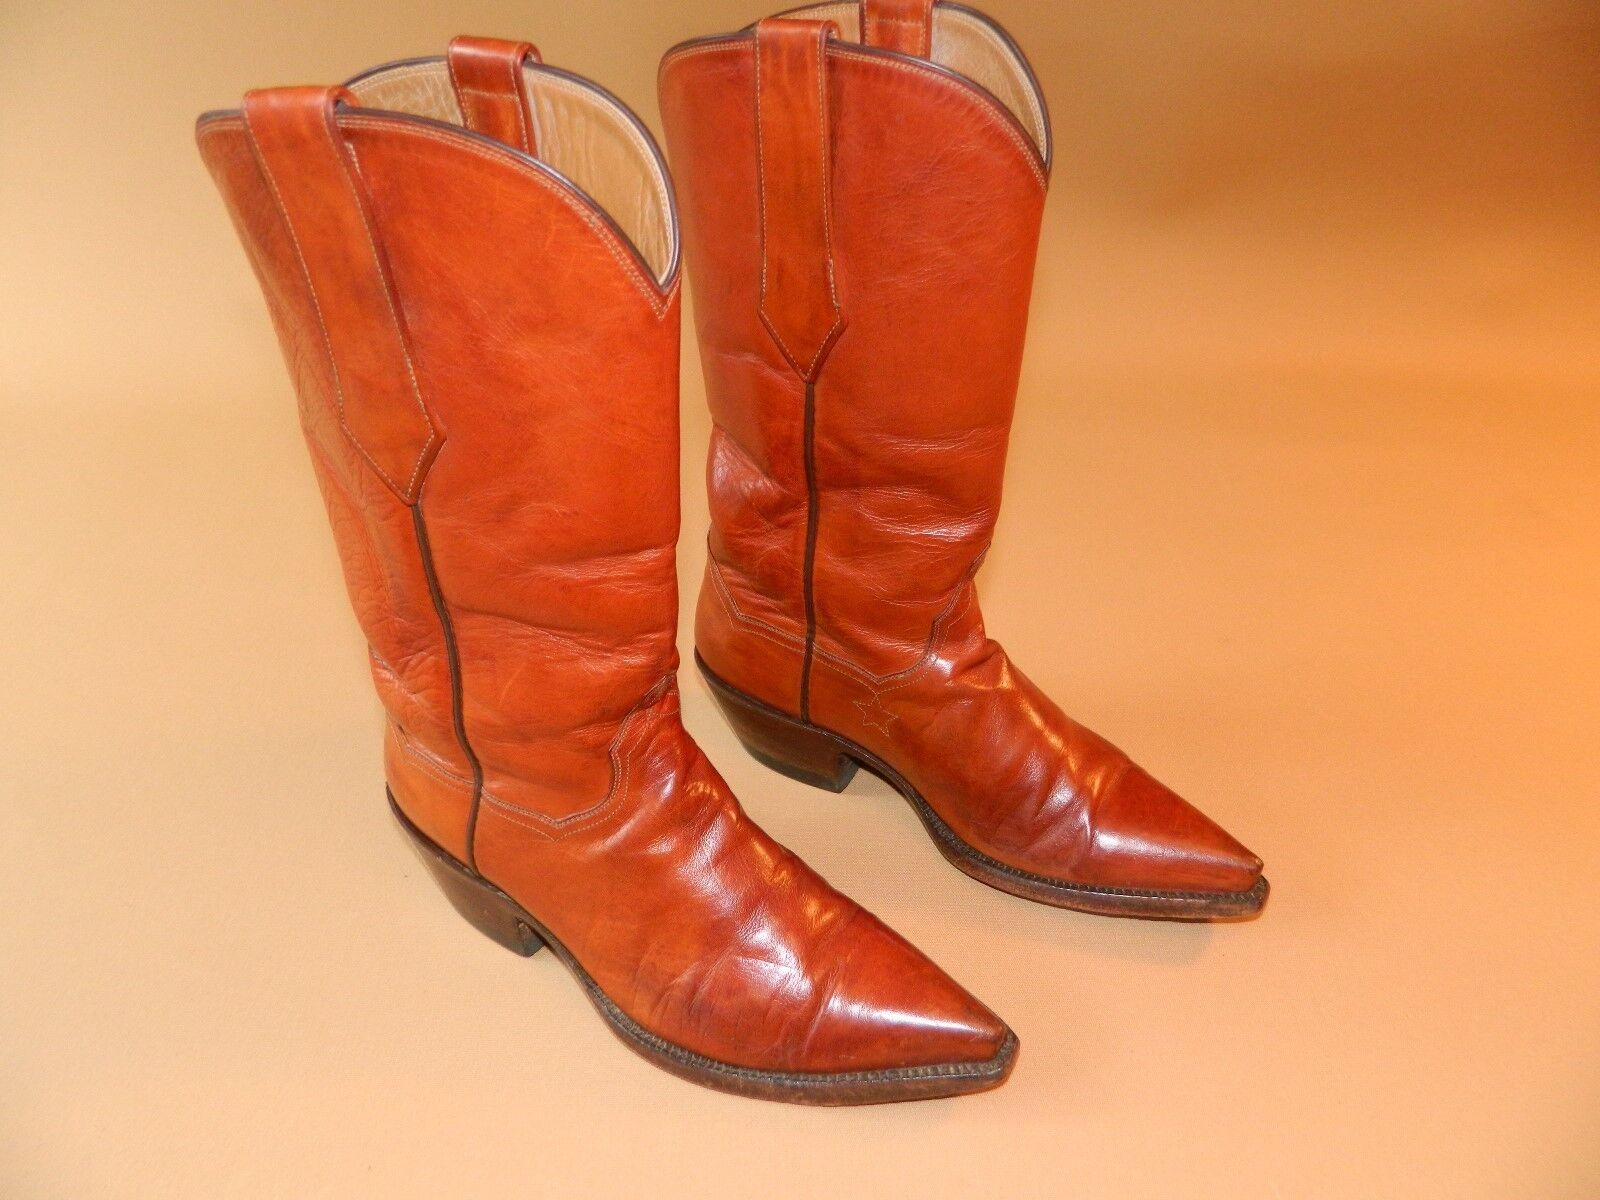 J.B. Hill Womens Cowboy Boots Size Size Size 6 b 195d73